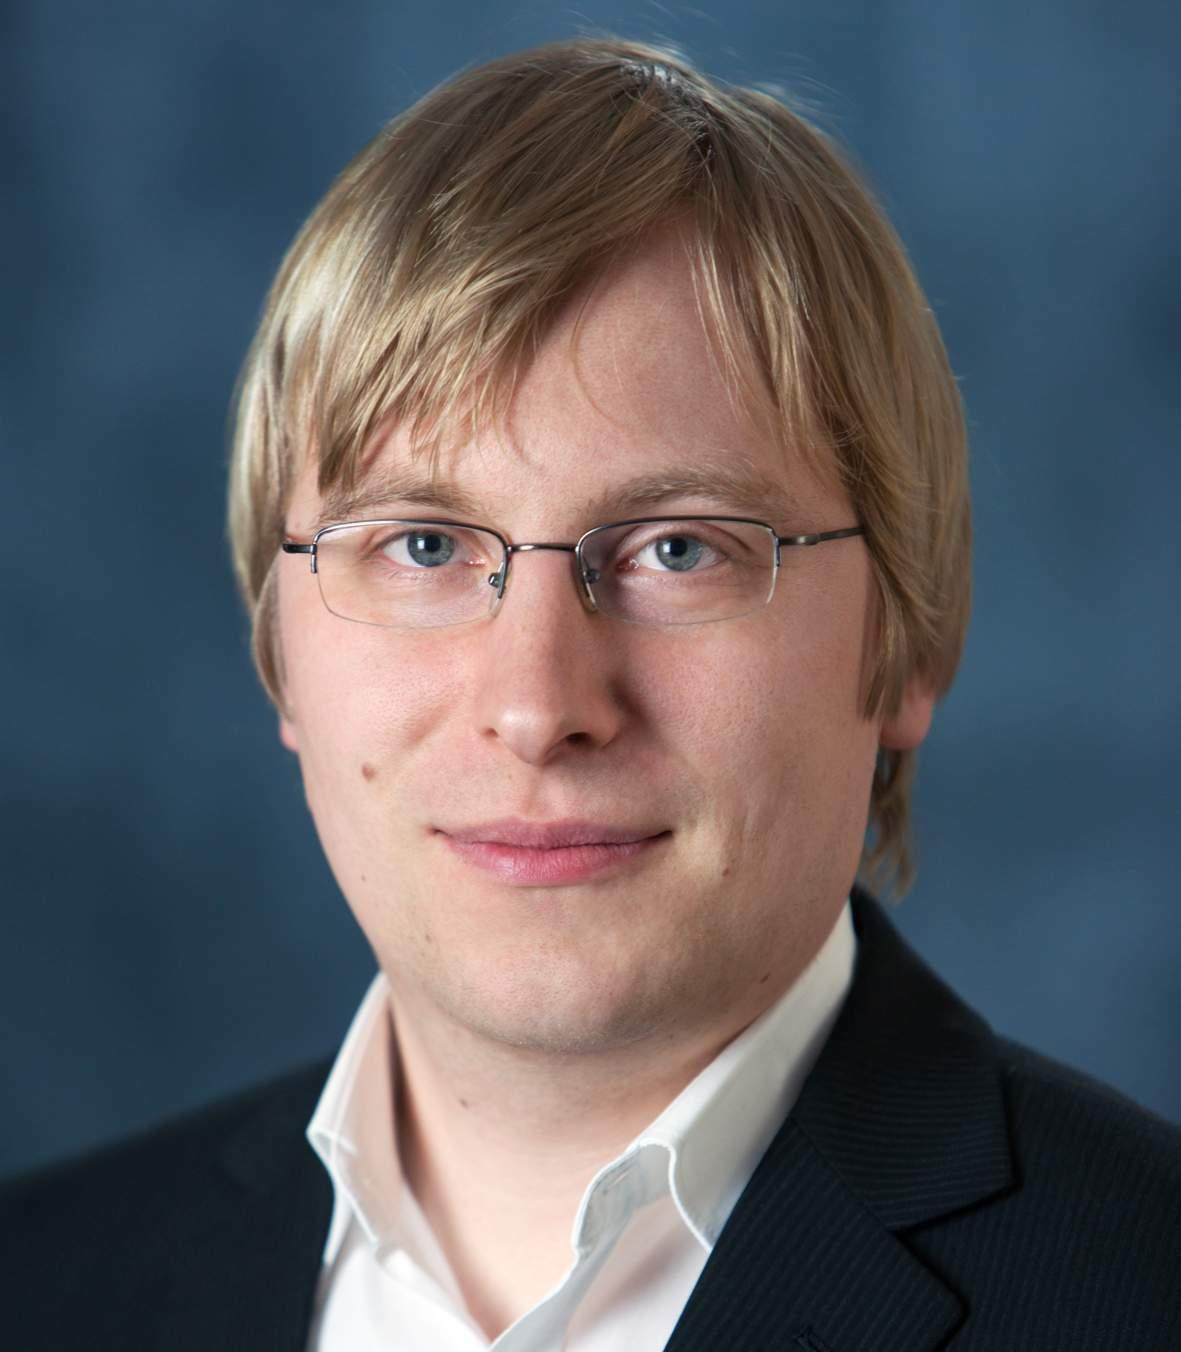 Dr. Christian Tetzlaff